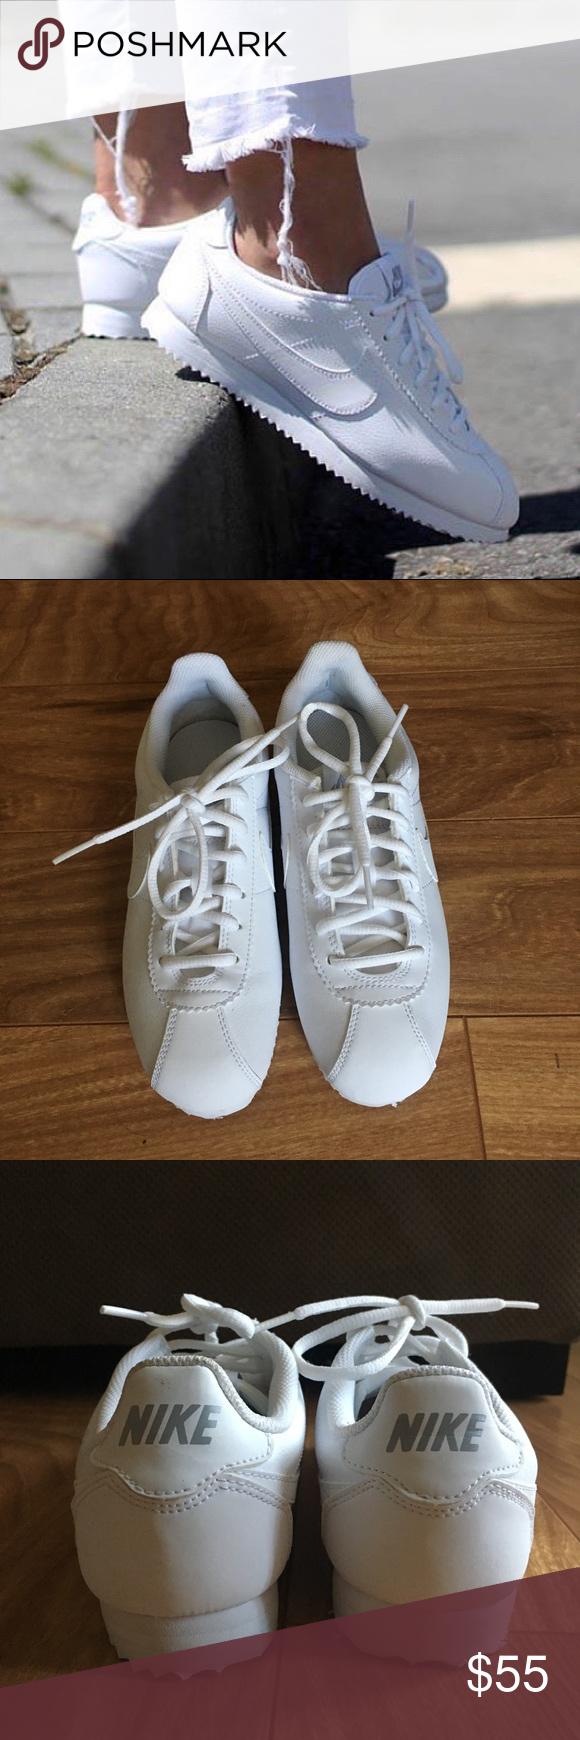 White Nike Cortez brand new white nike cortez for women!! Nike Shoes  Sneakers   My Posh Picks   Pinterest   Nike cortez, Women nike shoes and  Women nike